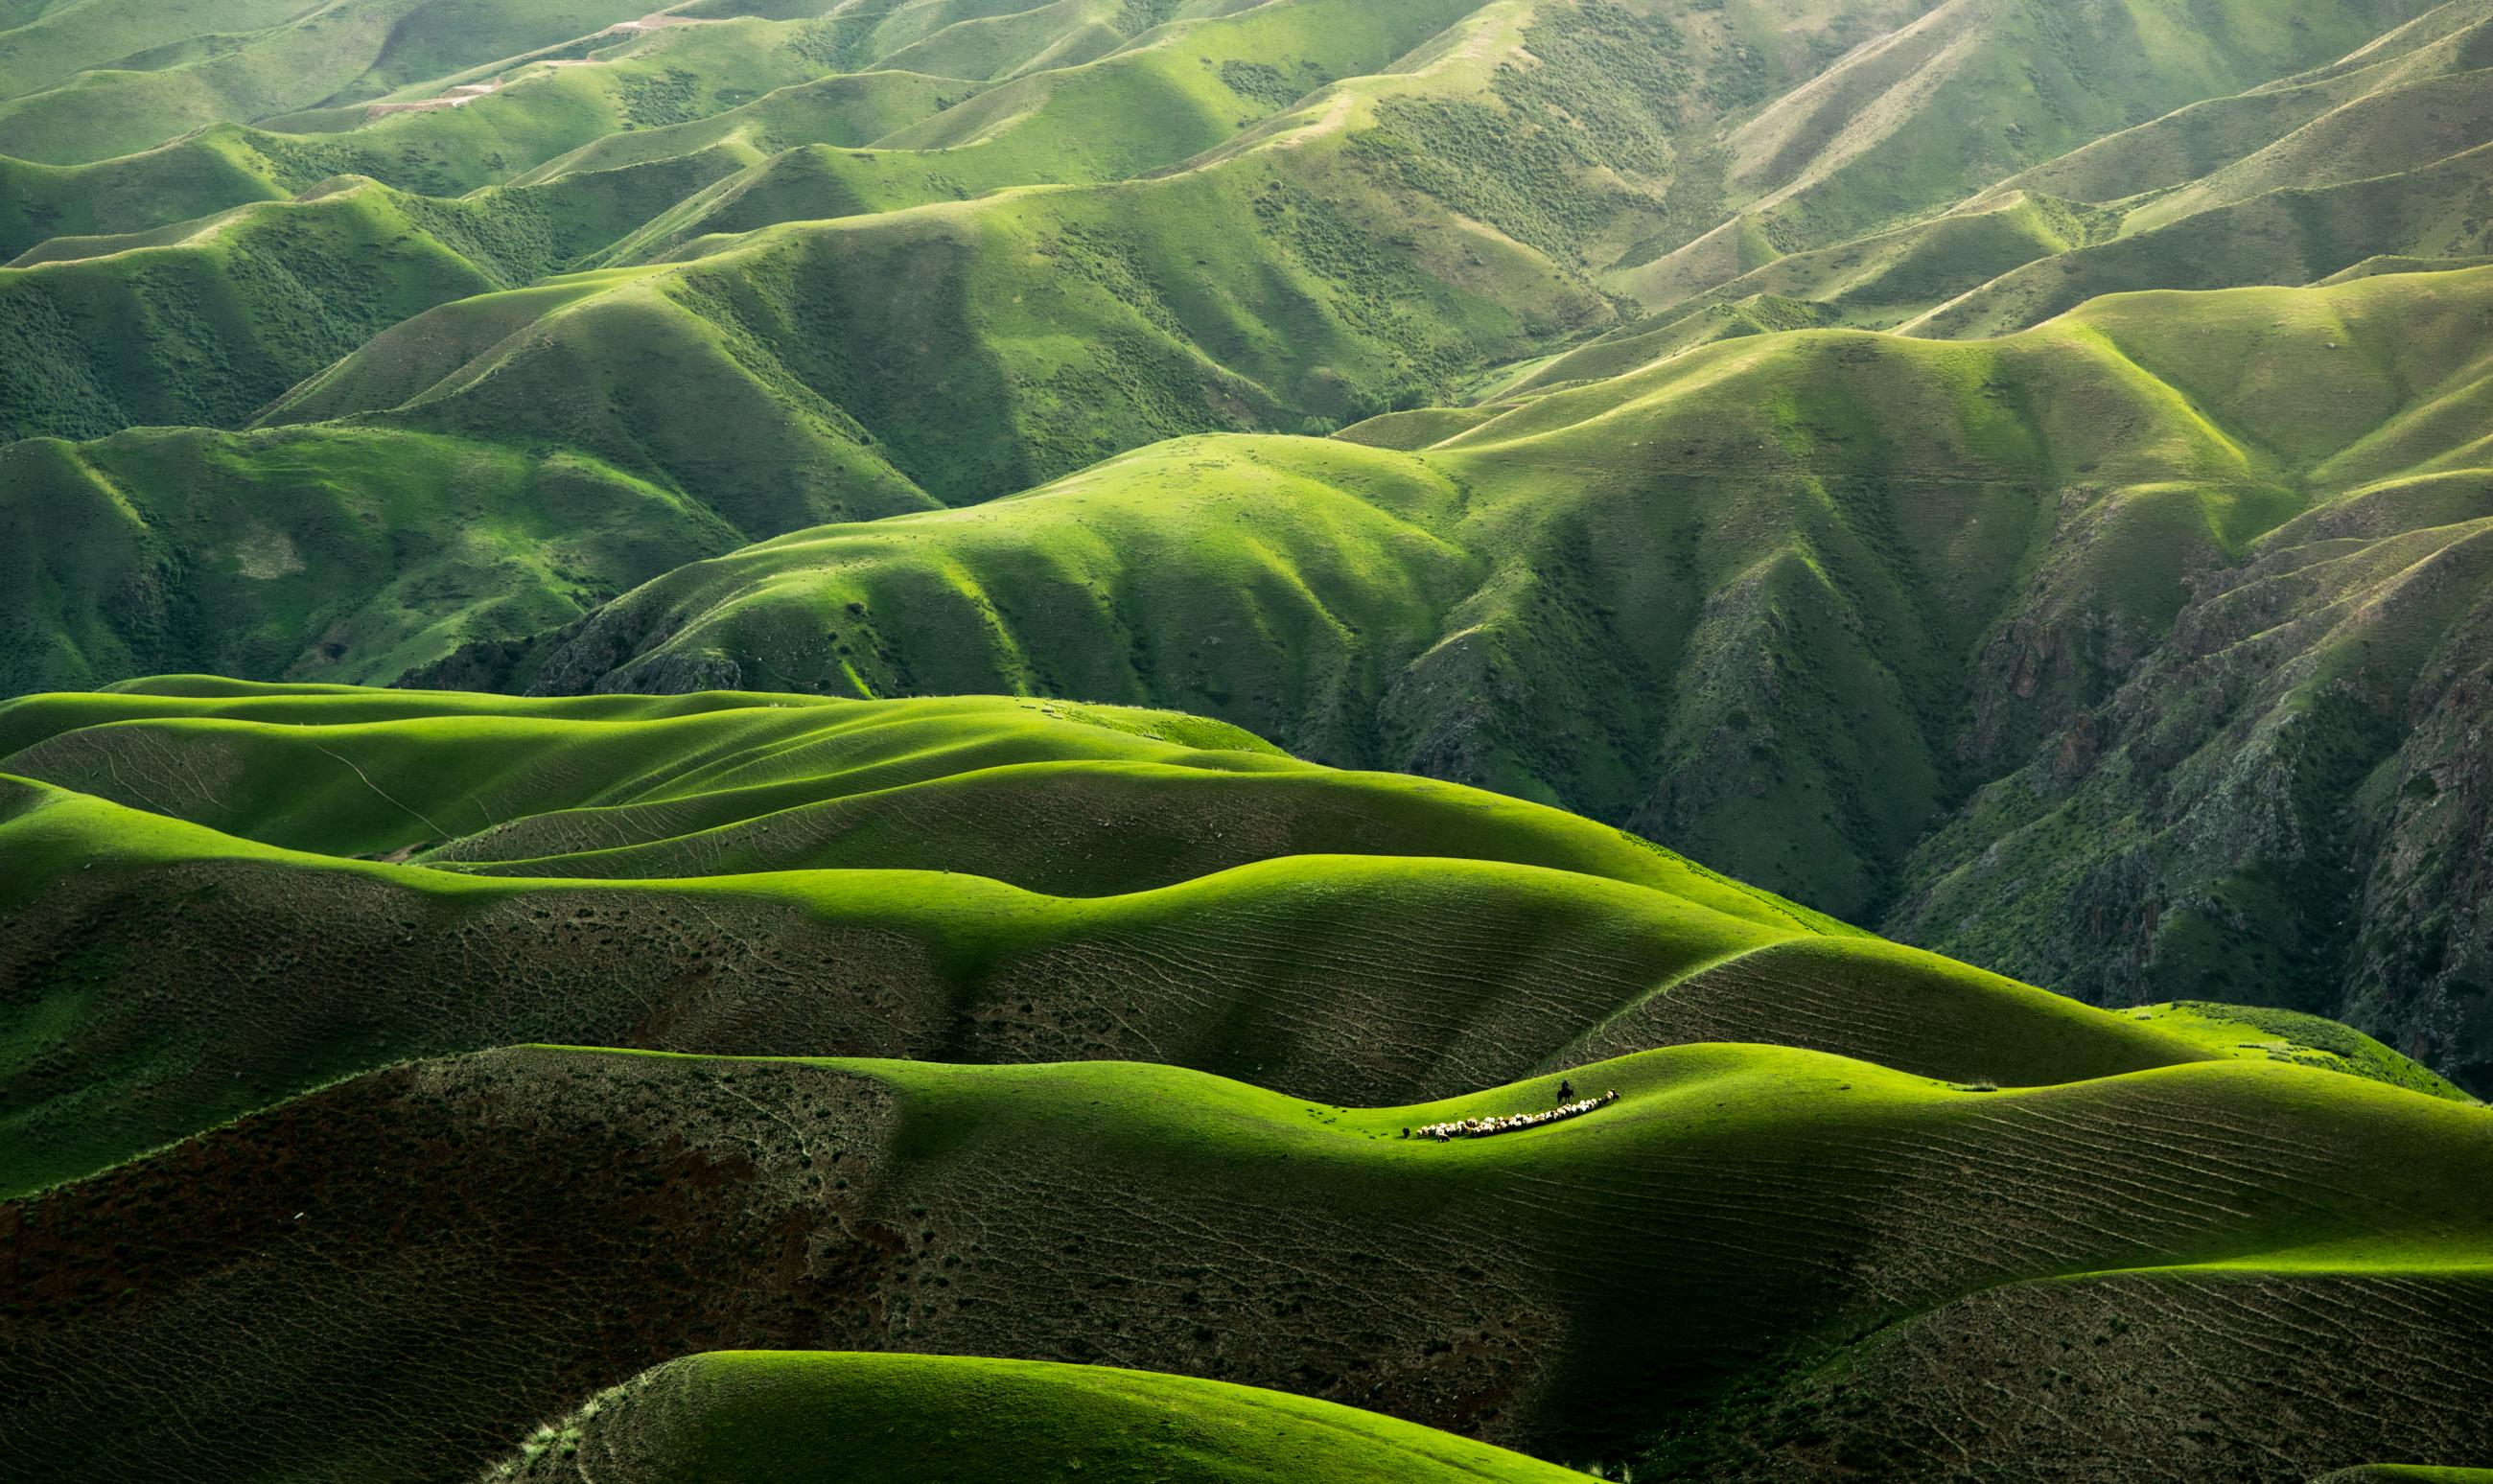 General 2600x1548 hills grass nature China green shadow